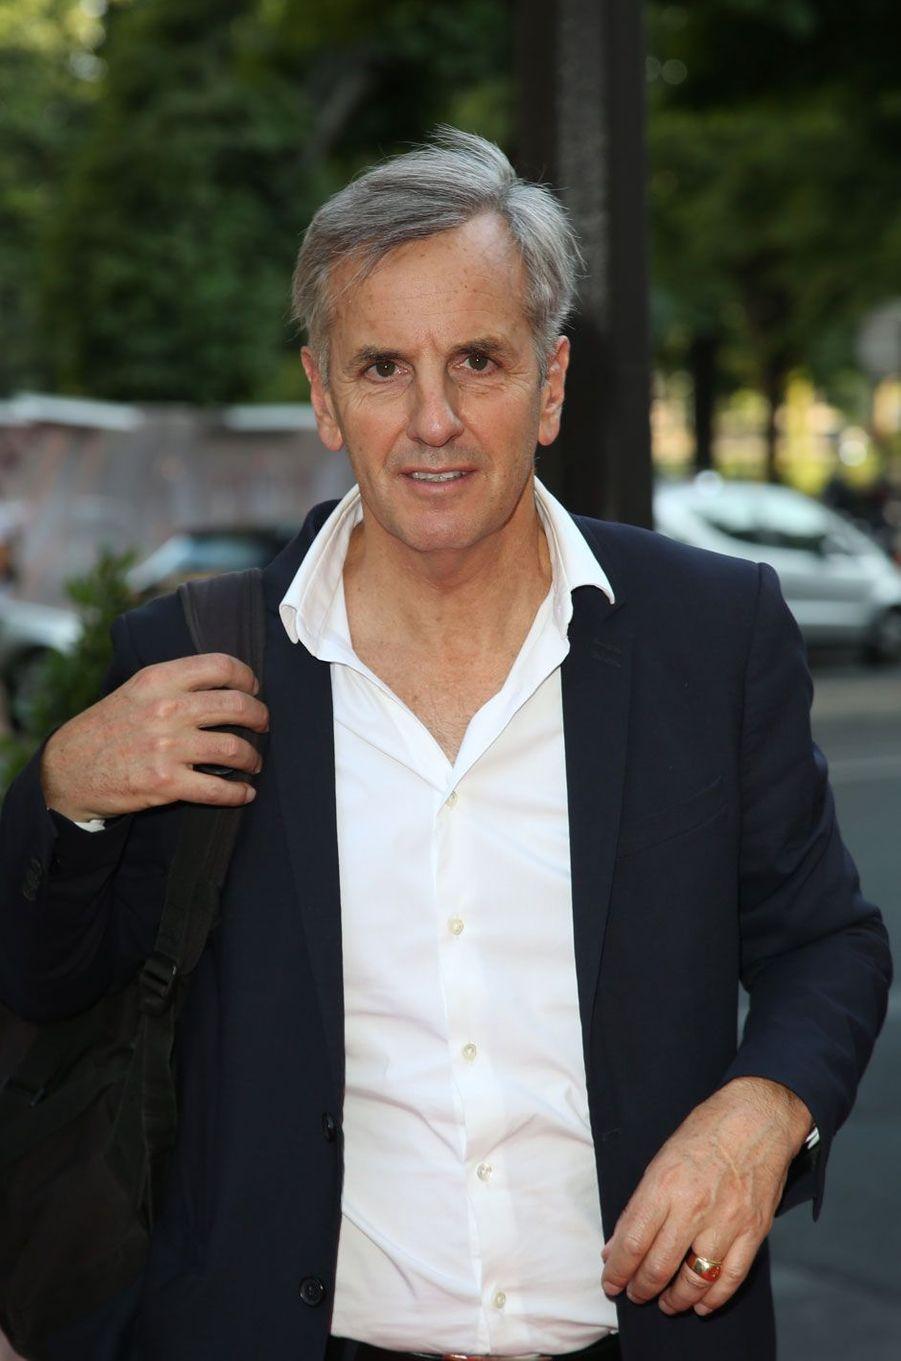 Bernard de la Villardière